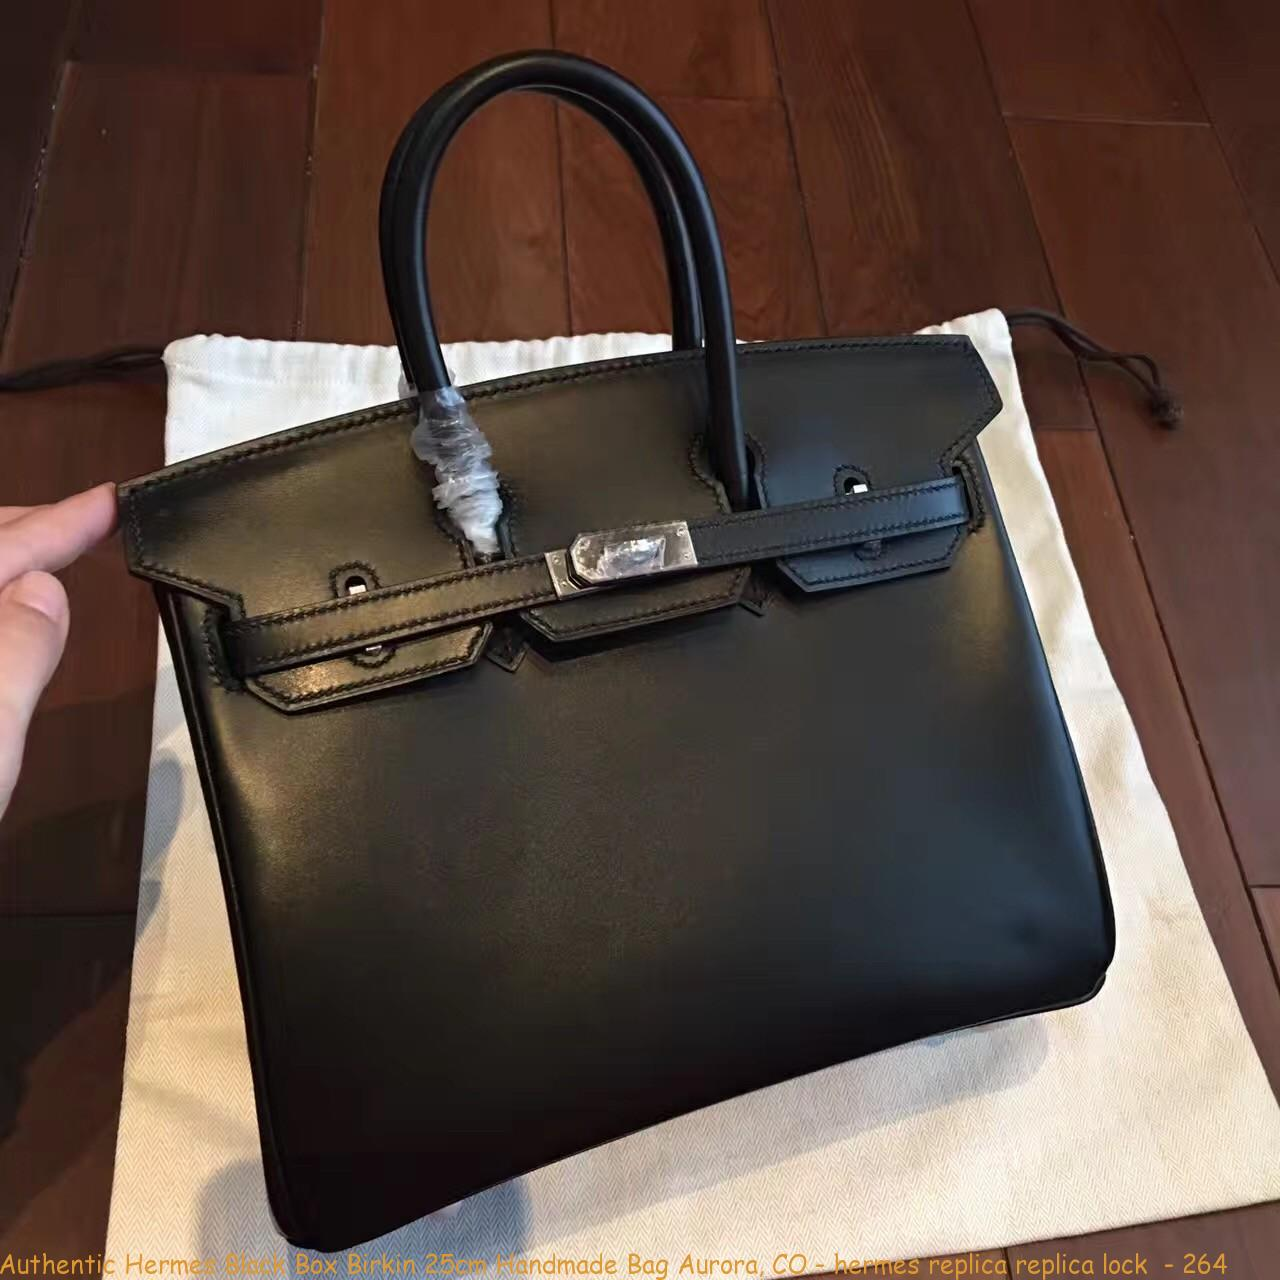 Authentic Hermes Black Box Birkin 25cm Handmade Bag Aurora ... 49e69659a1014